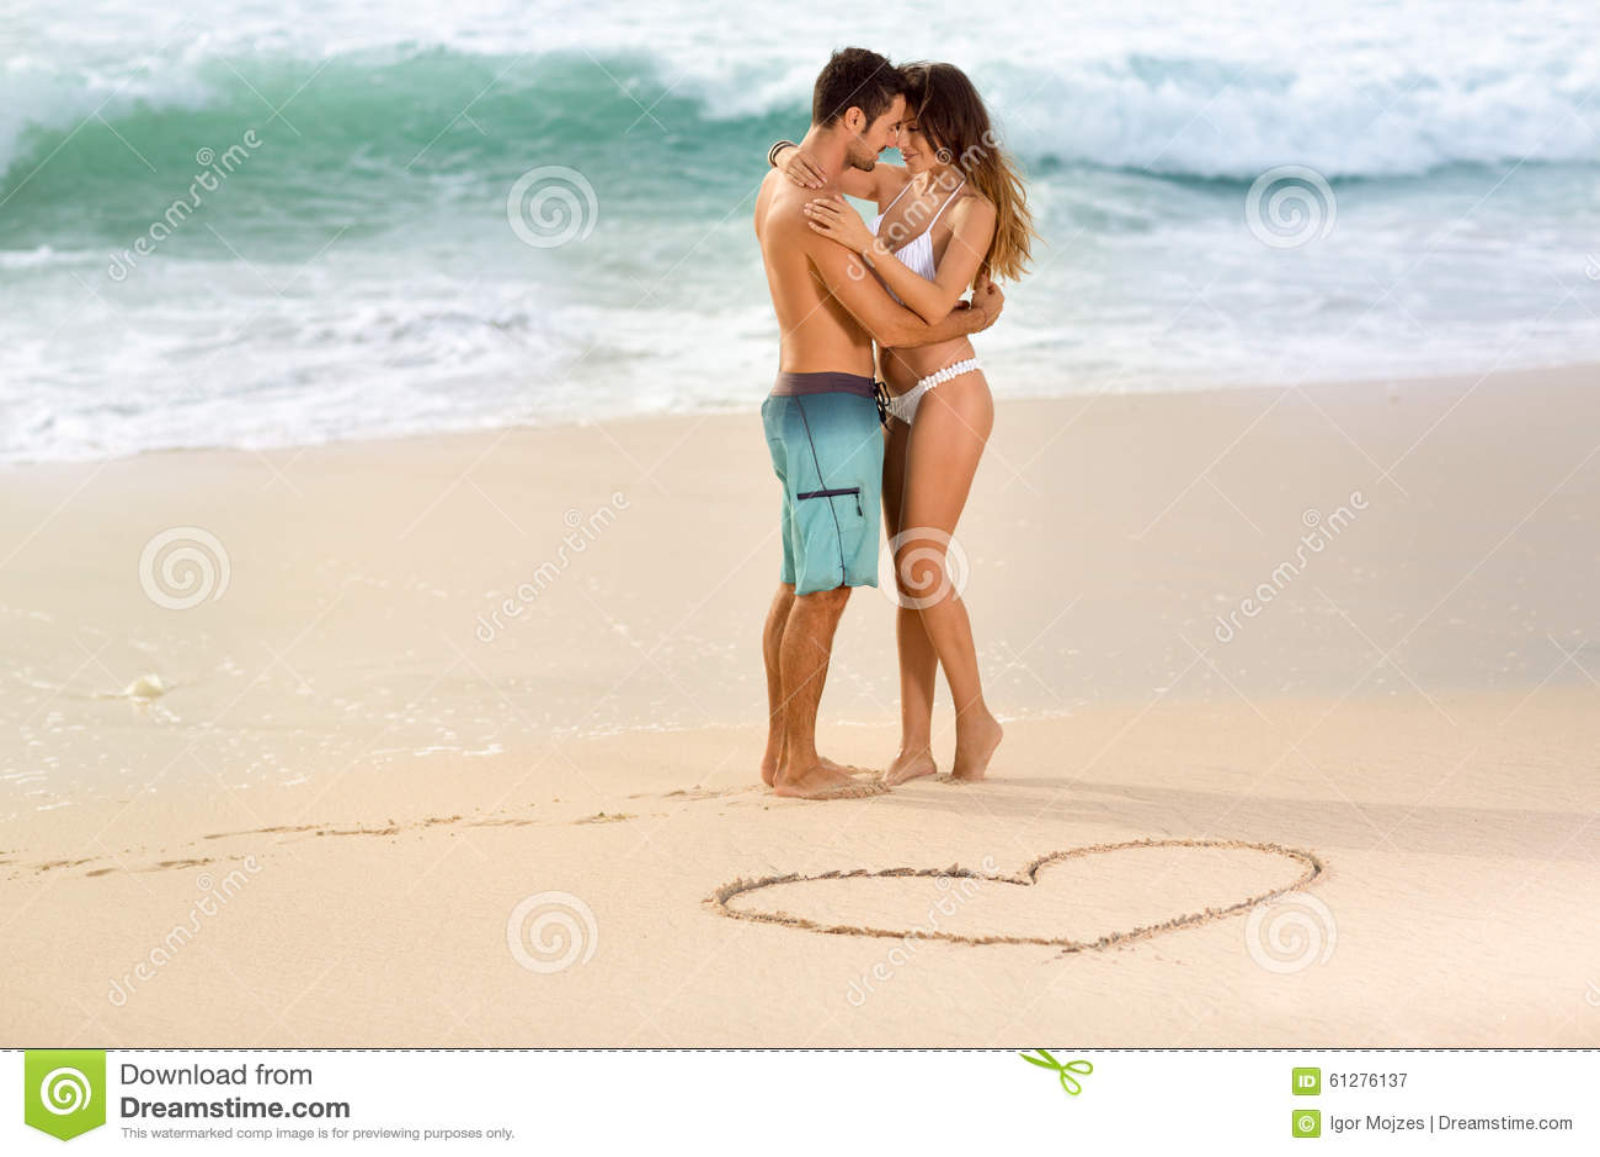 stock video love couple drawing beach